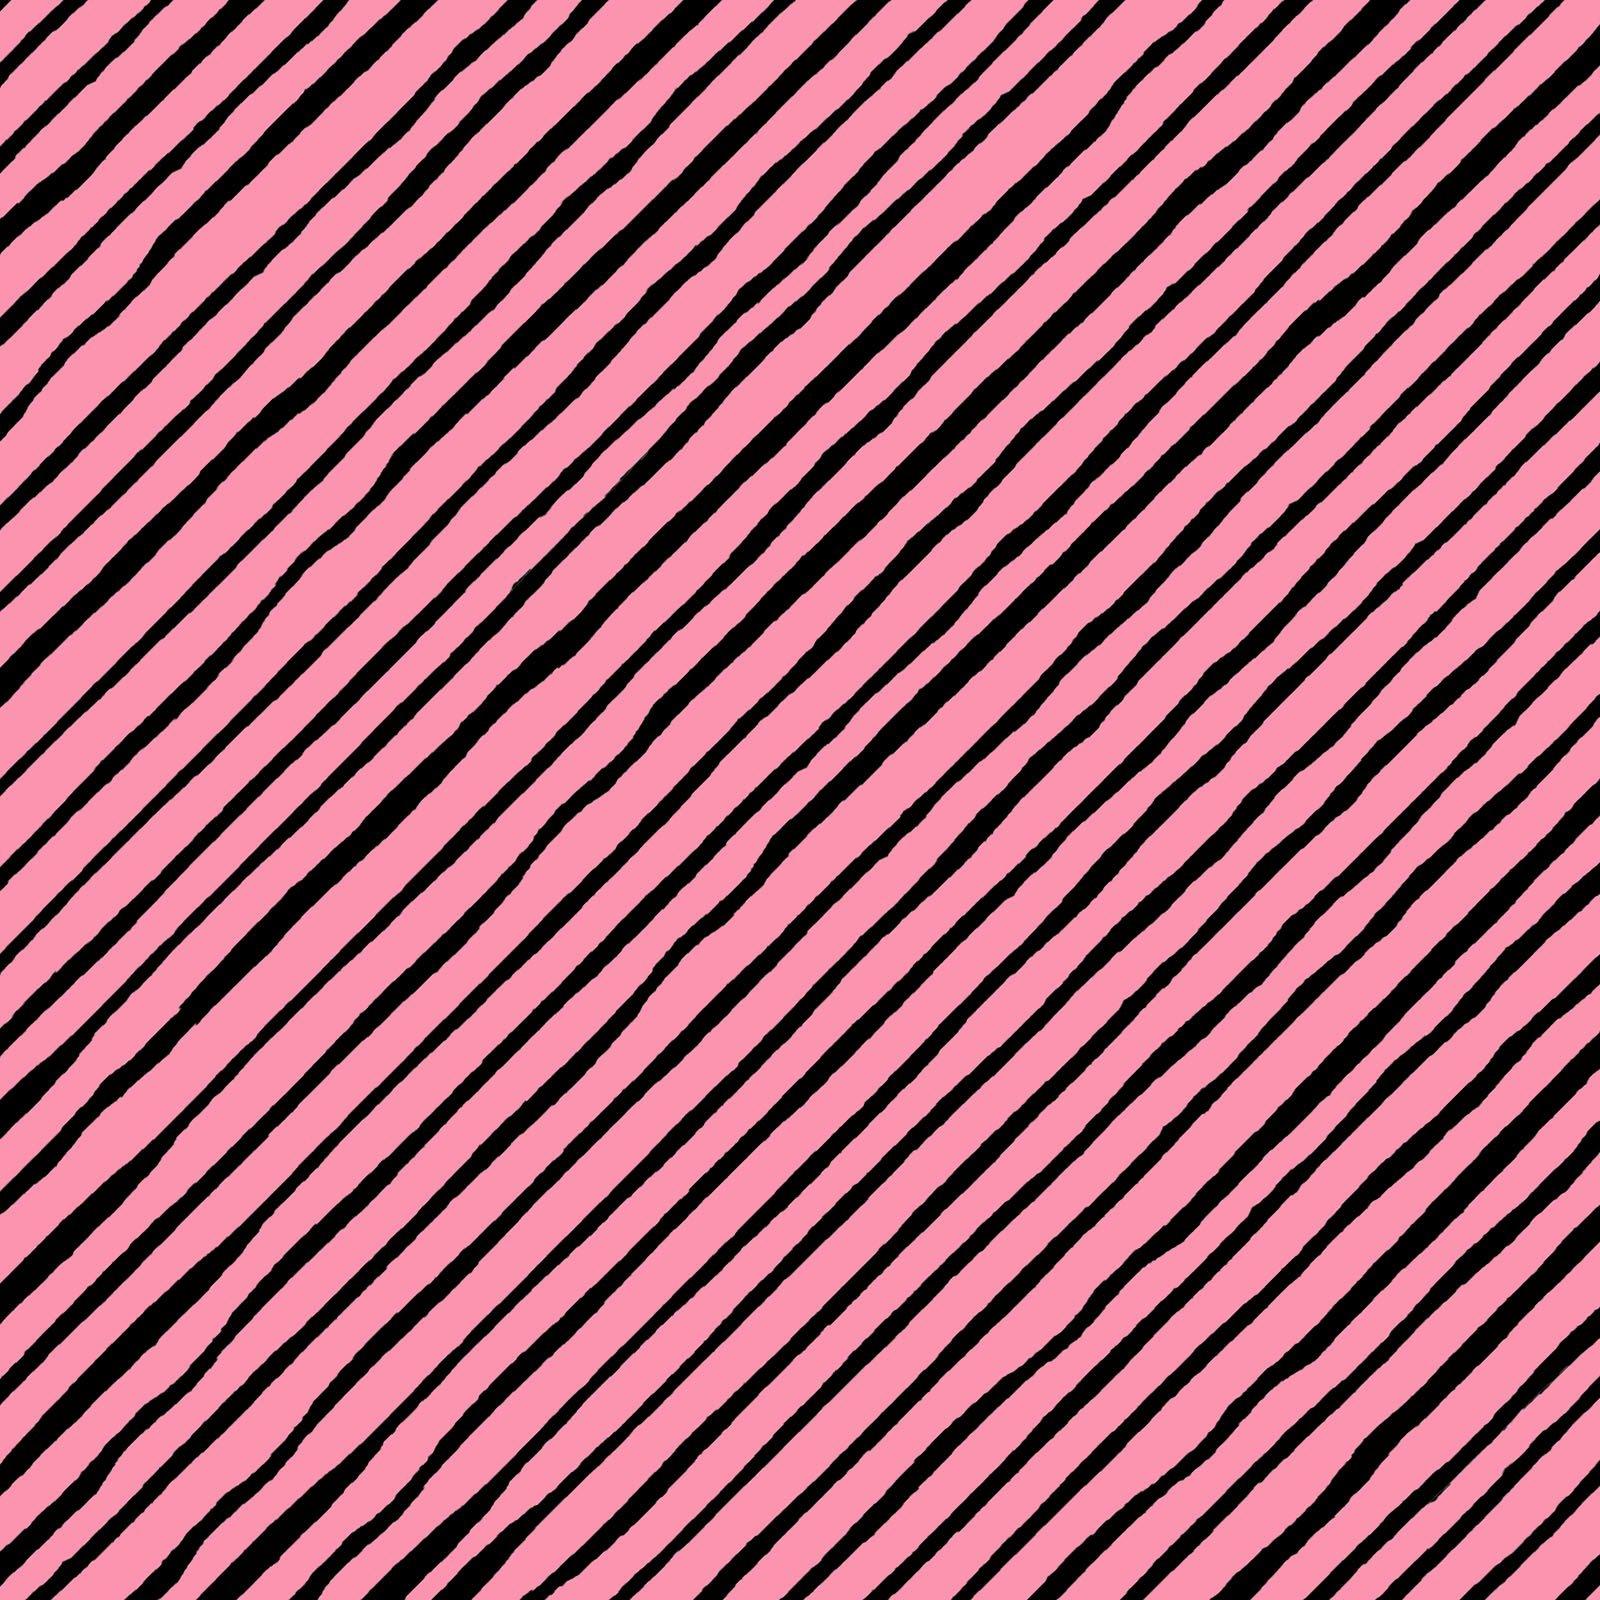 Sorta Stripe Bias - Pink/Black<br/>Loralie Designs 692-189